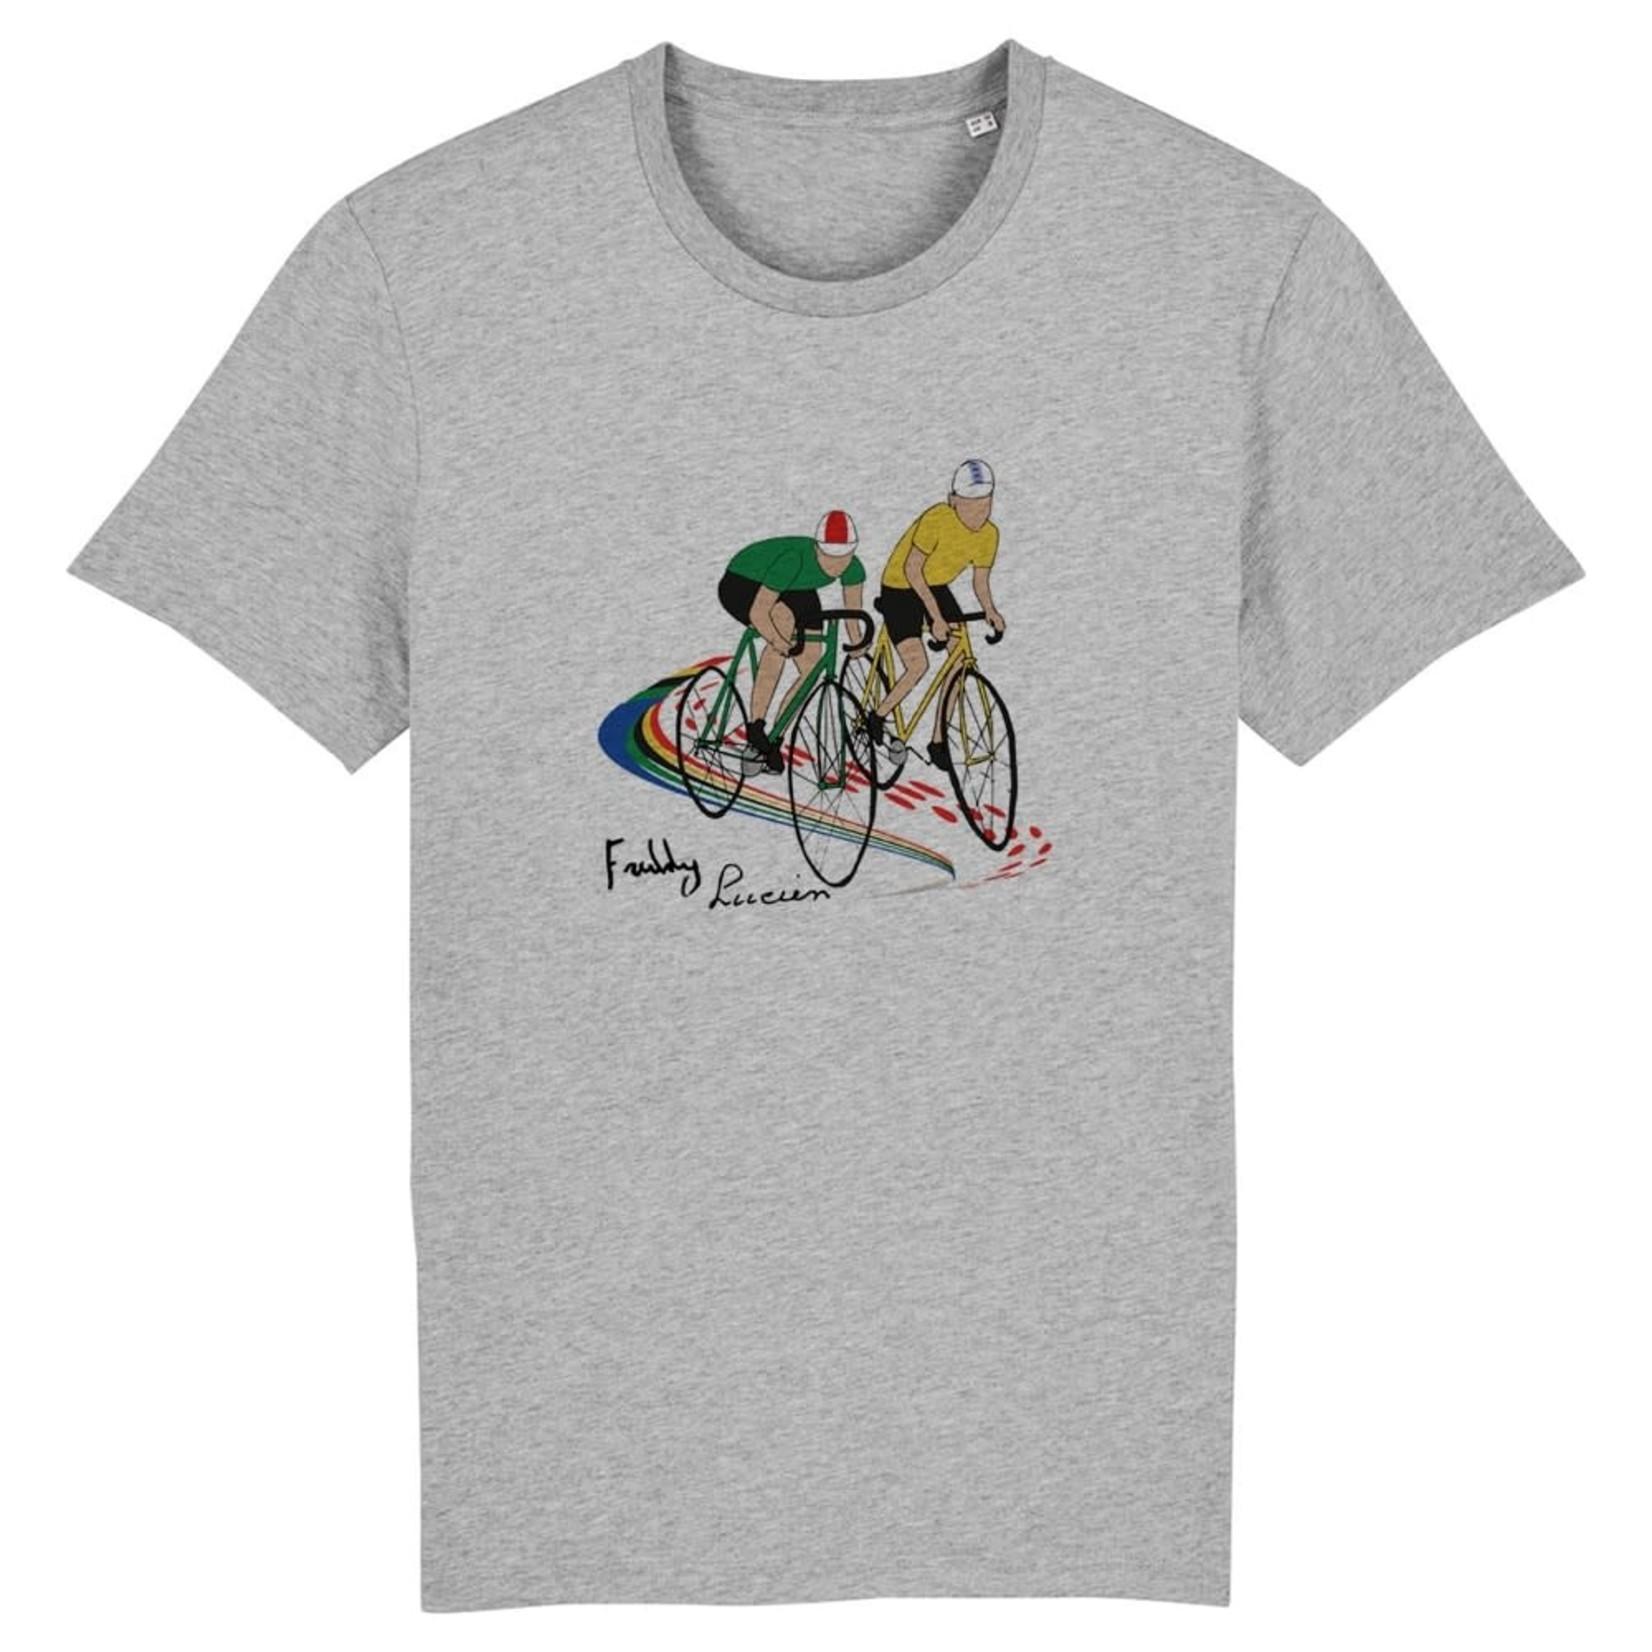 T-shirt 'Lucien en Freddy' grijs